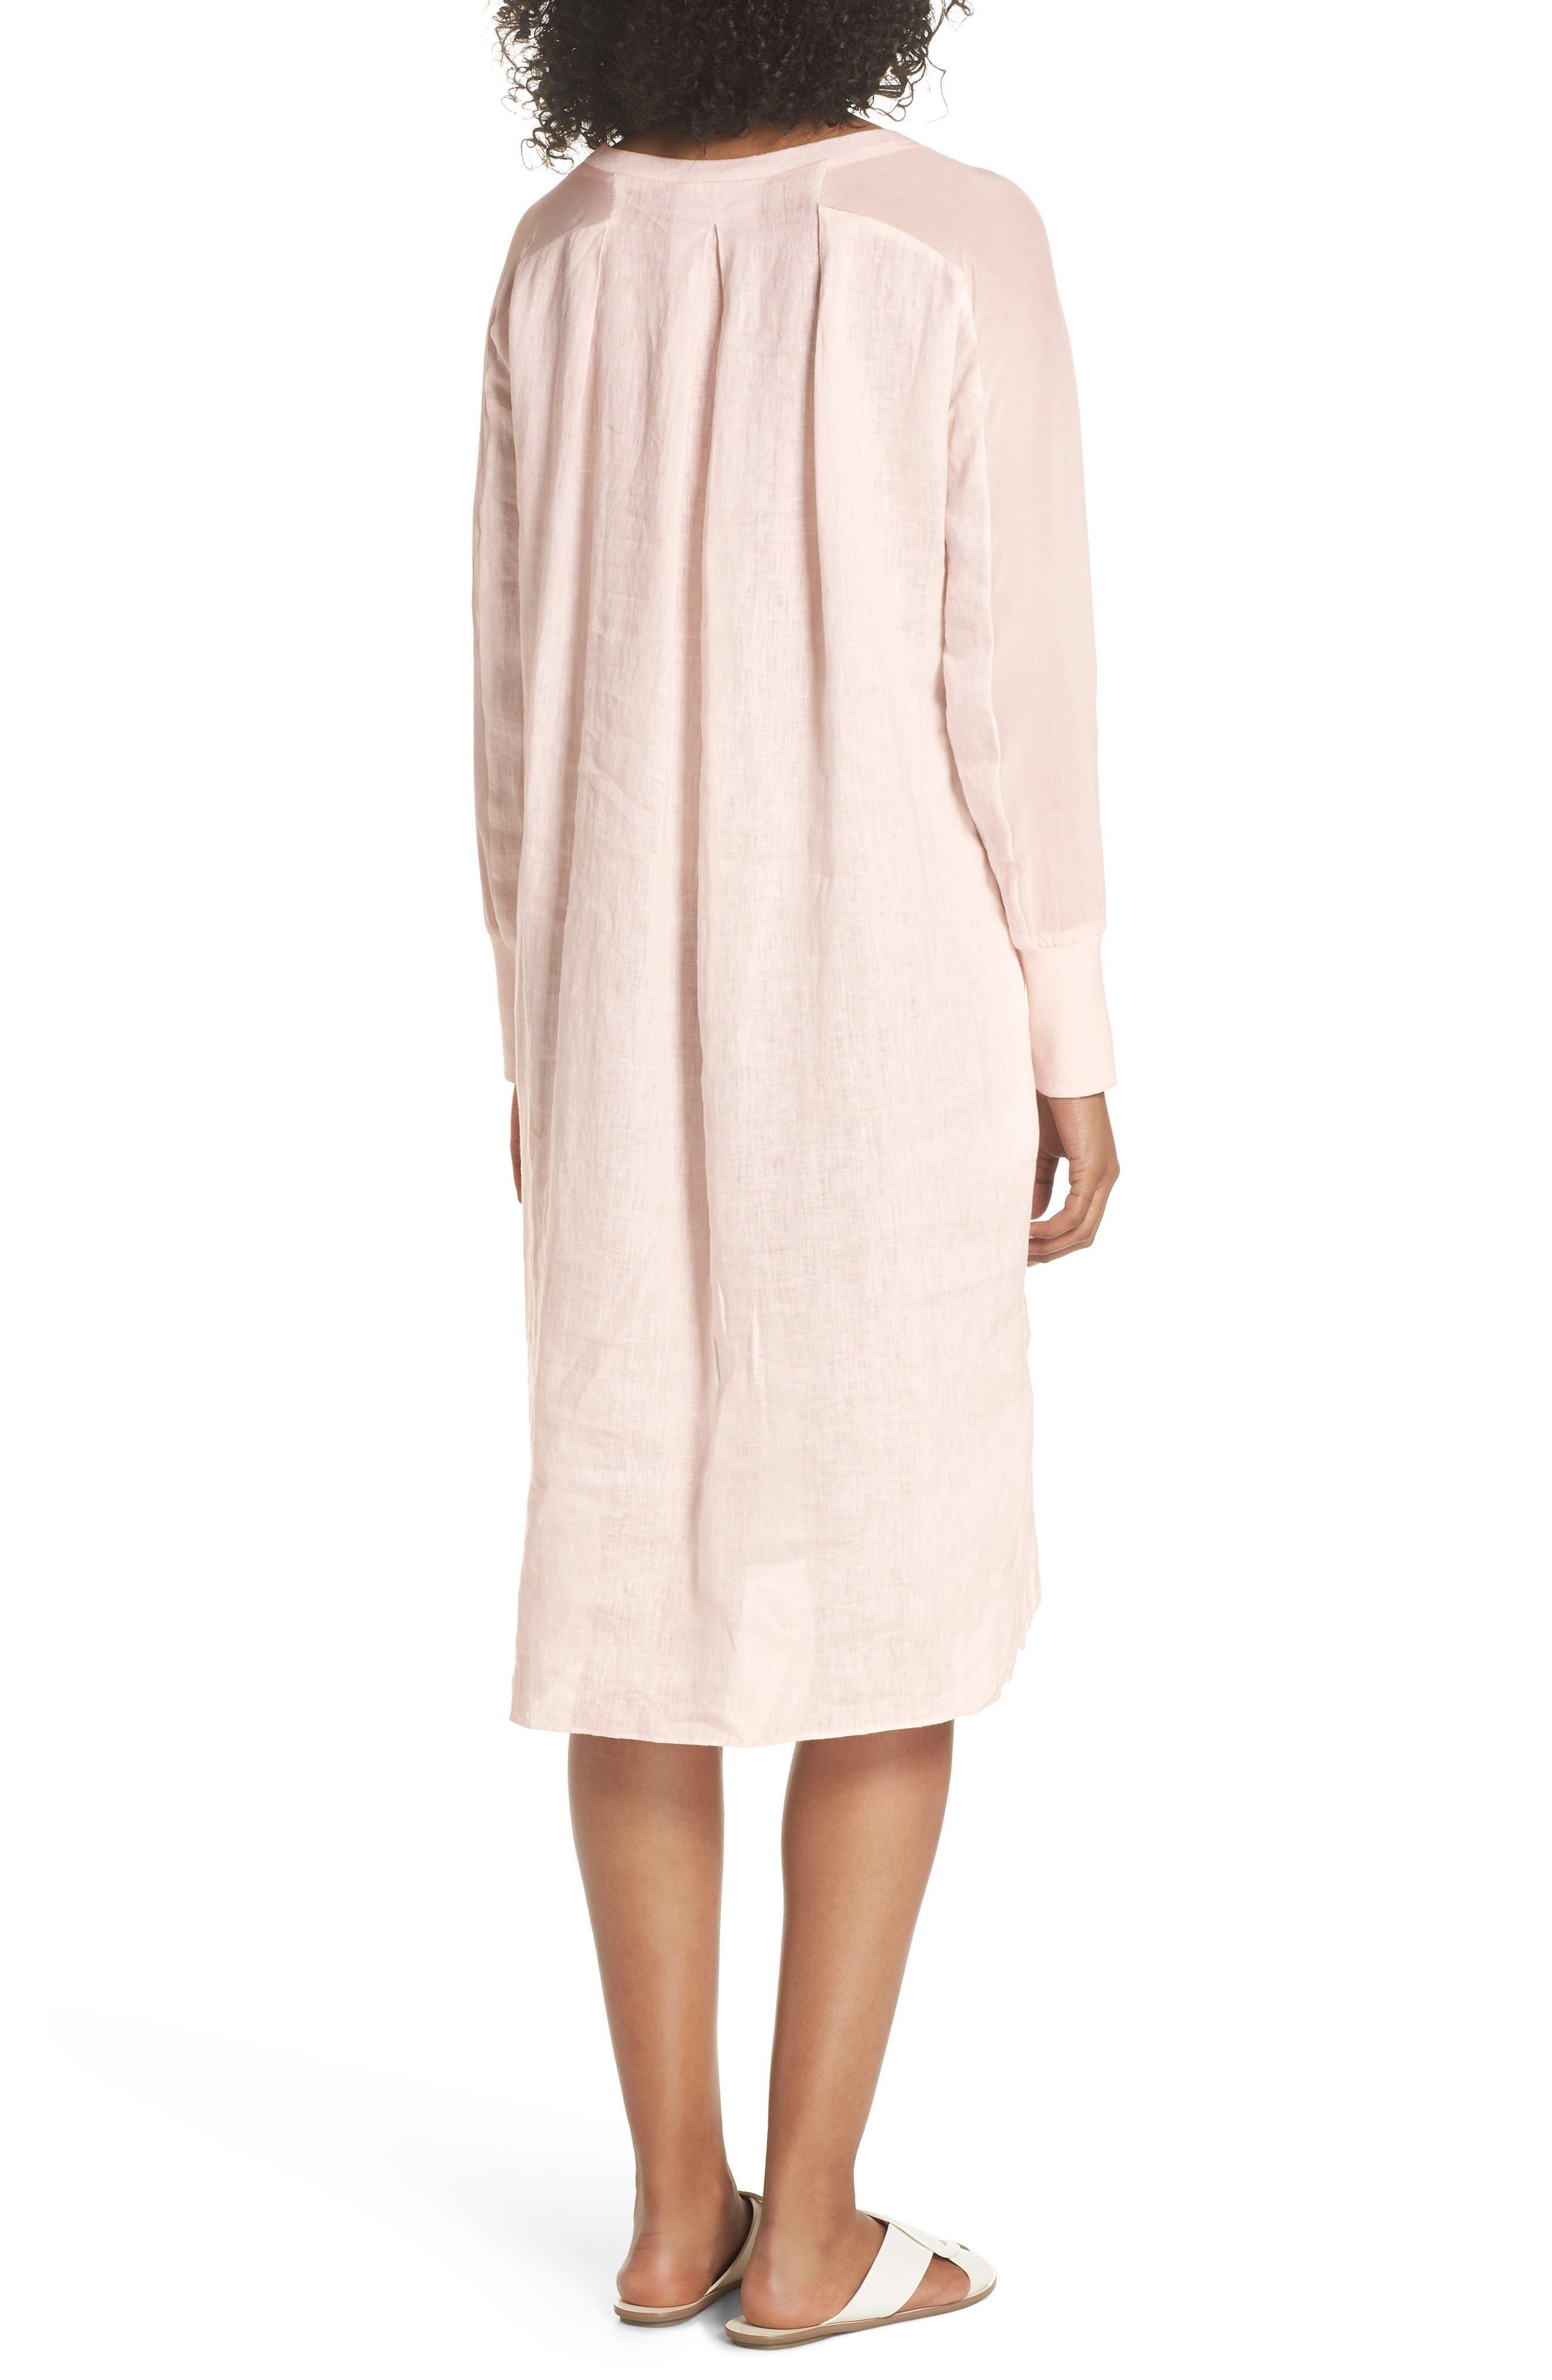 Rata Linen Shift Dress,                             Alternate thumbnail 2, color,                             680